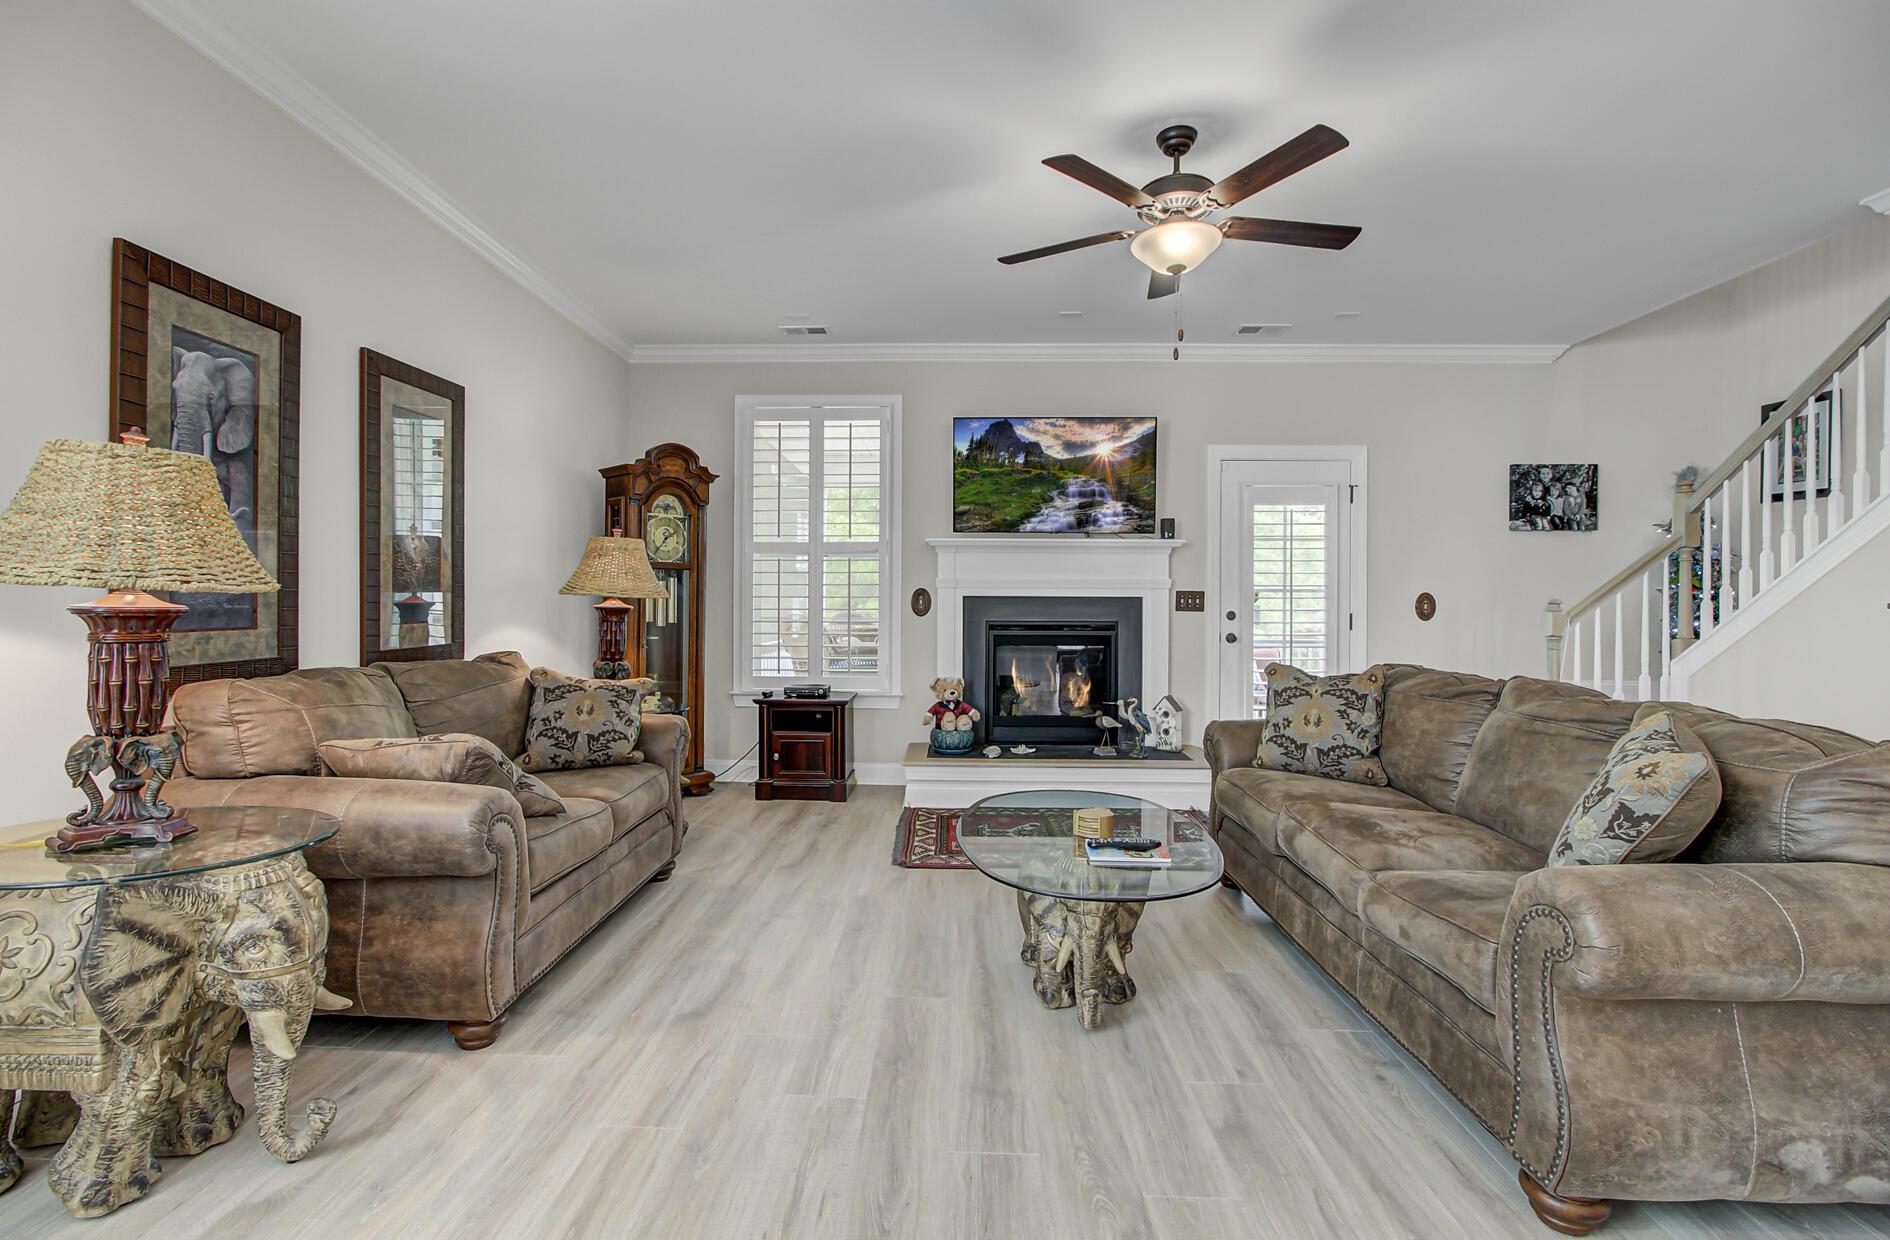 Park West Homes For Sale - 2824 Wagner, Mount Pleasant, SC - 18